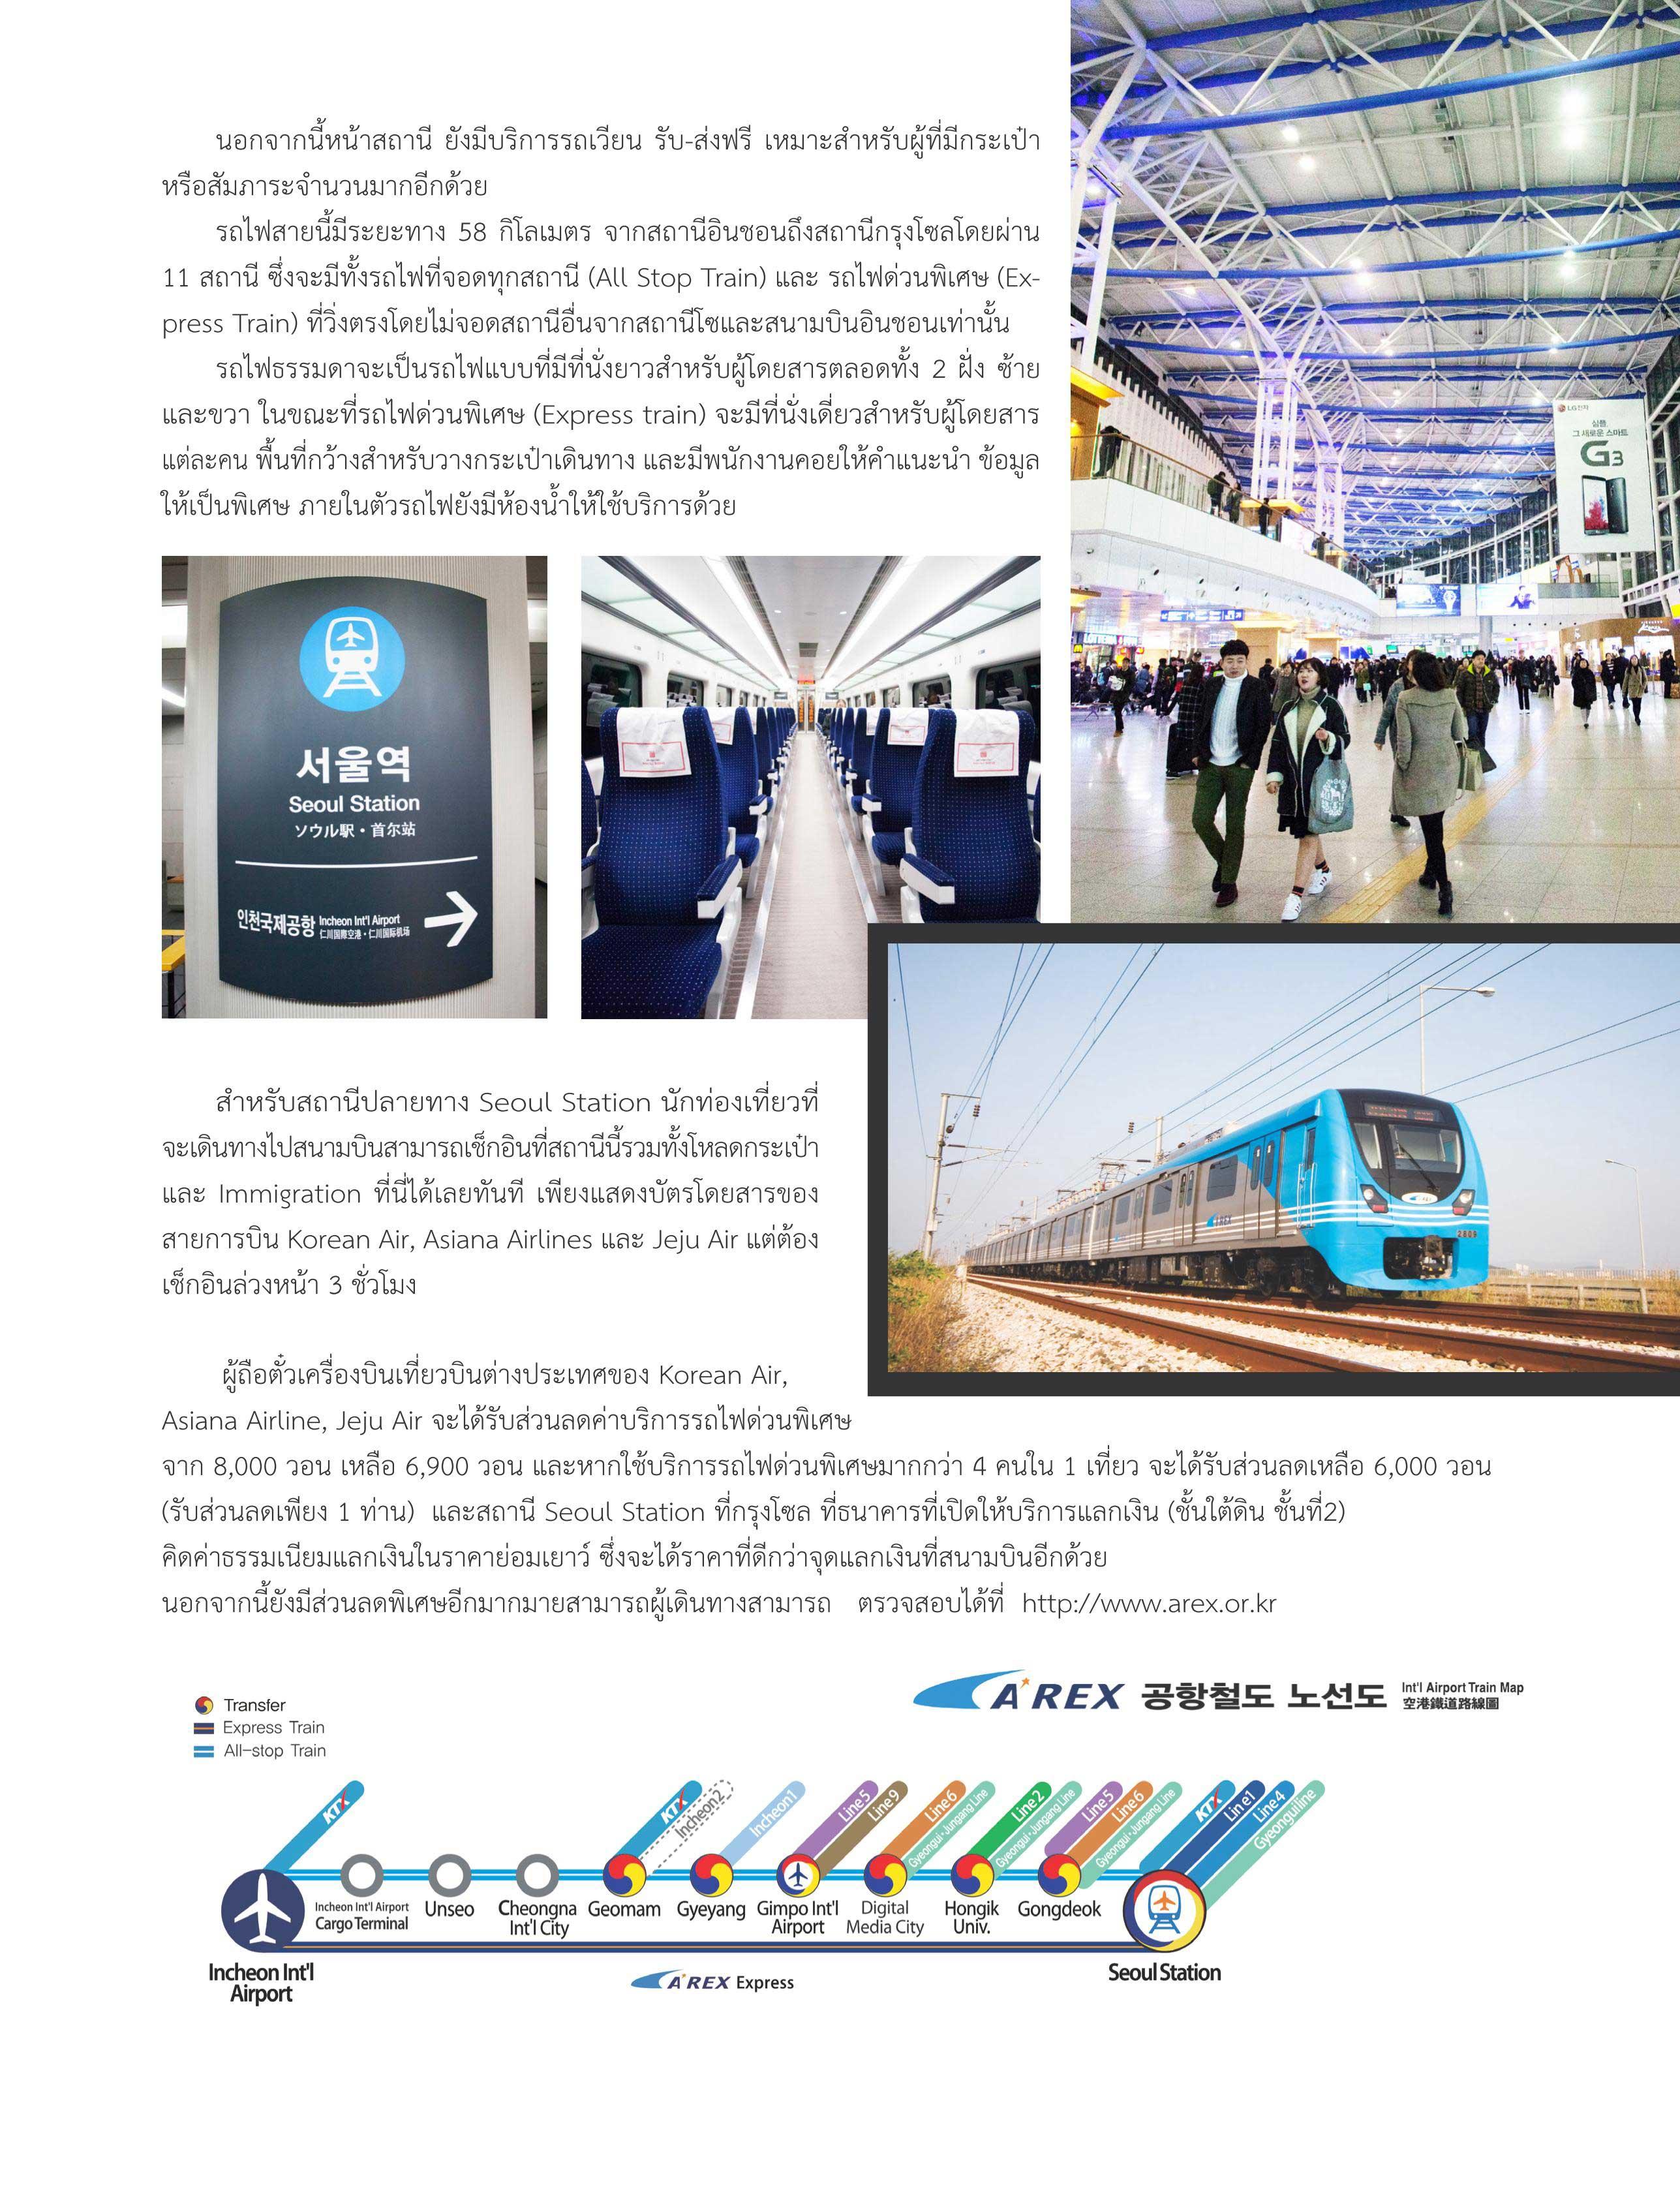 A-REX review 2015 page 2